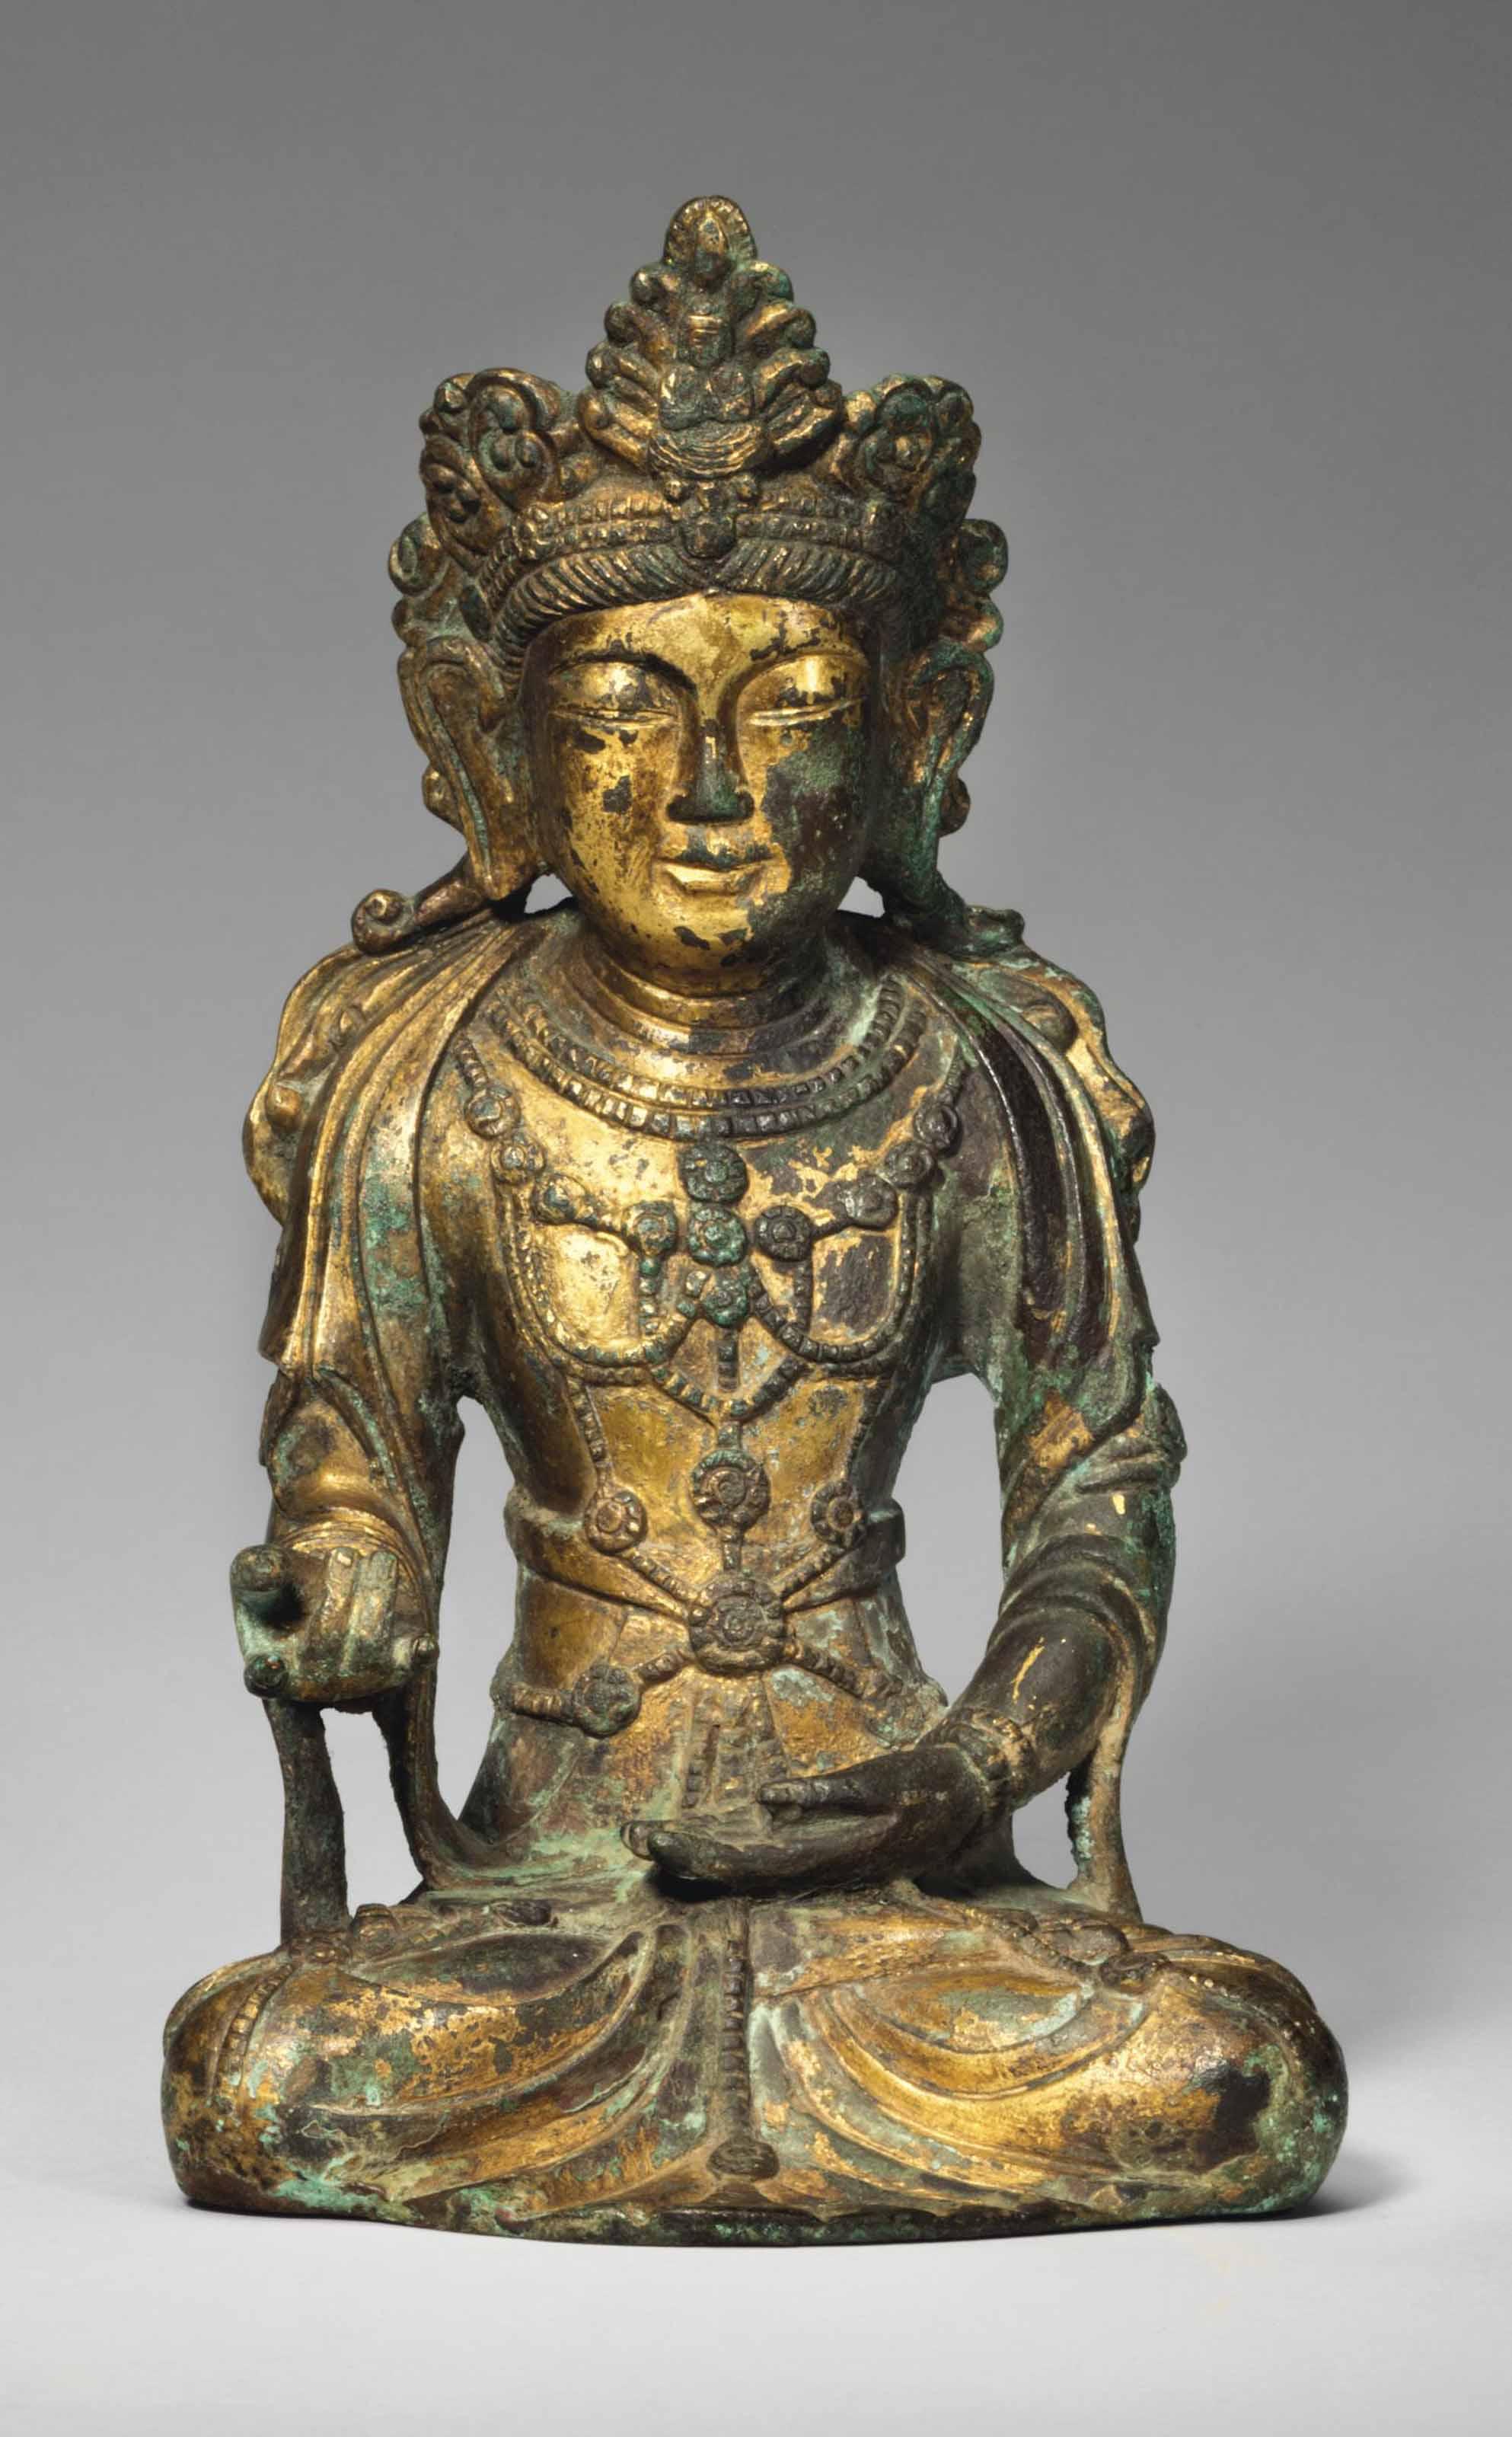 A gilt-bronze seated figure of